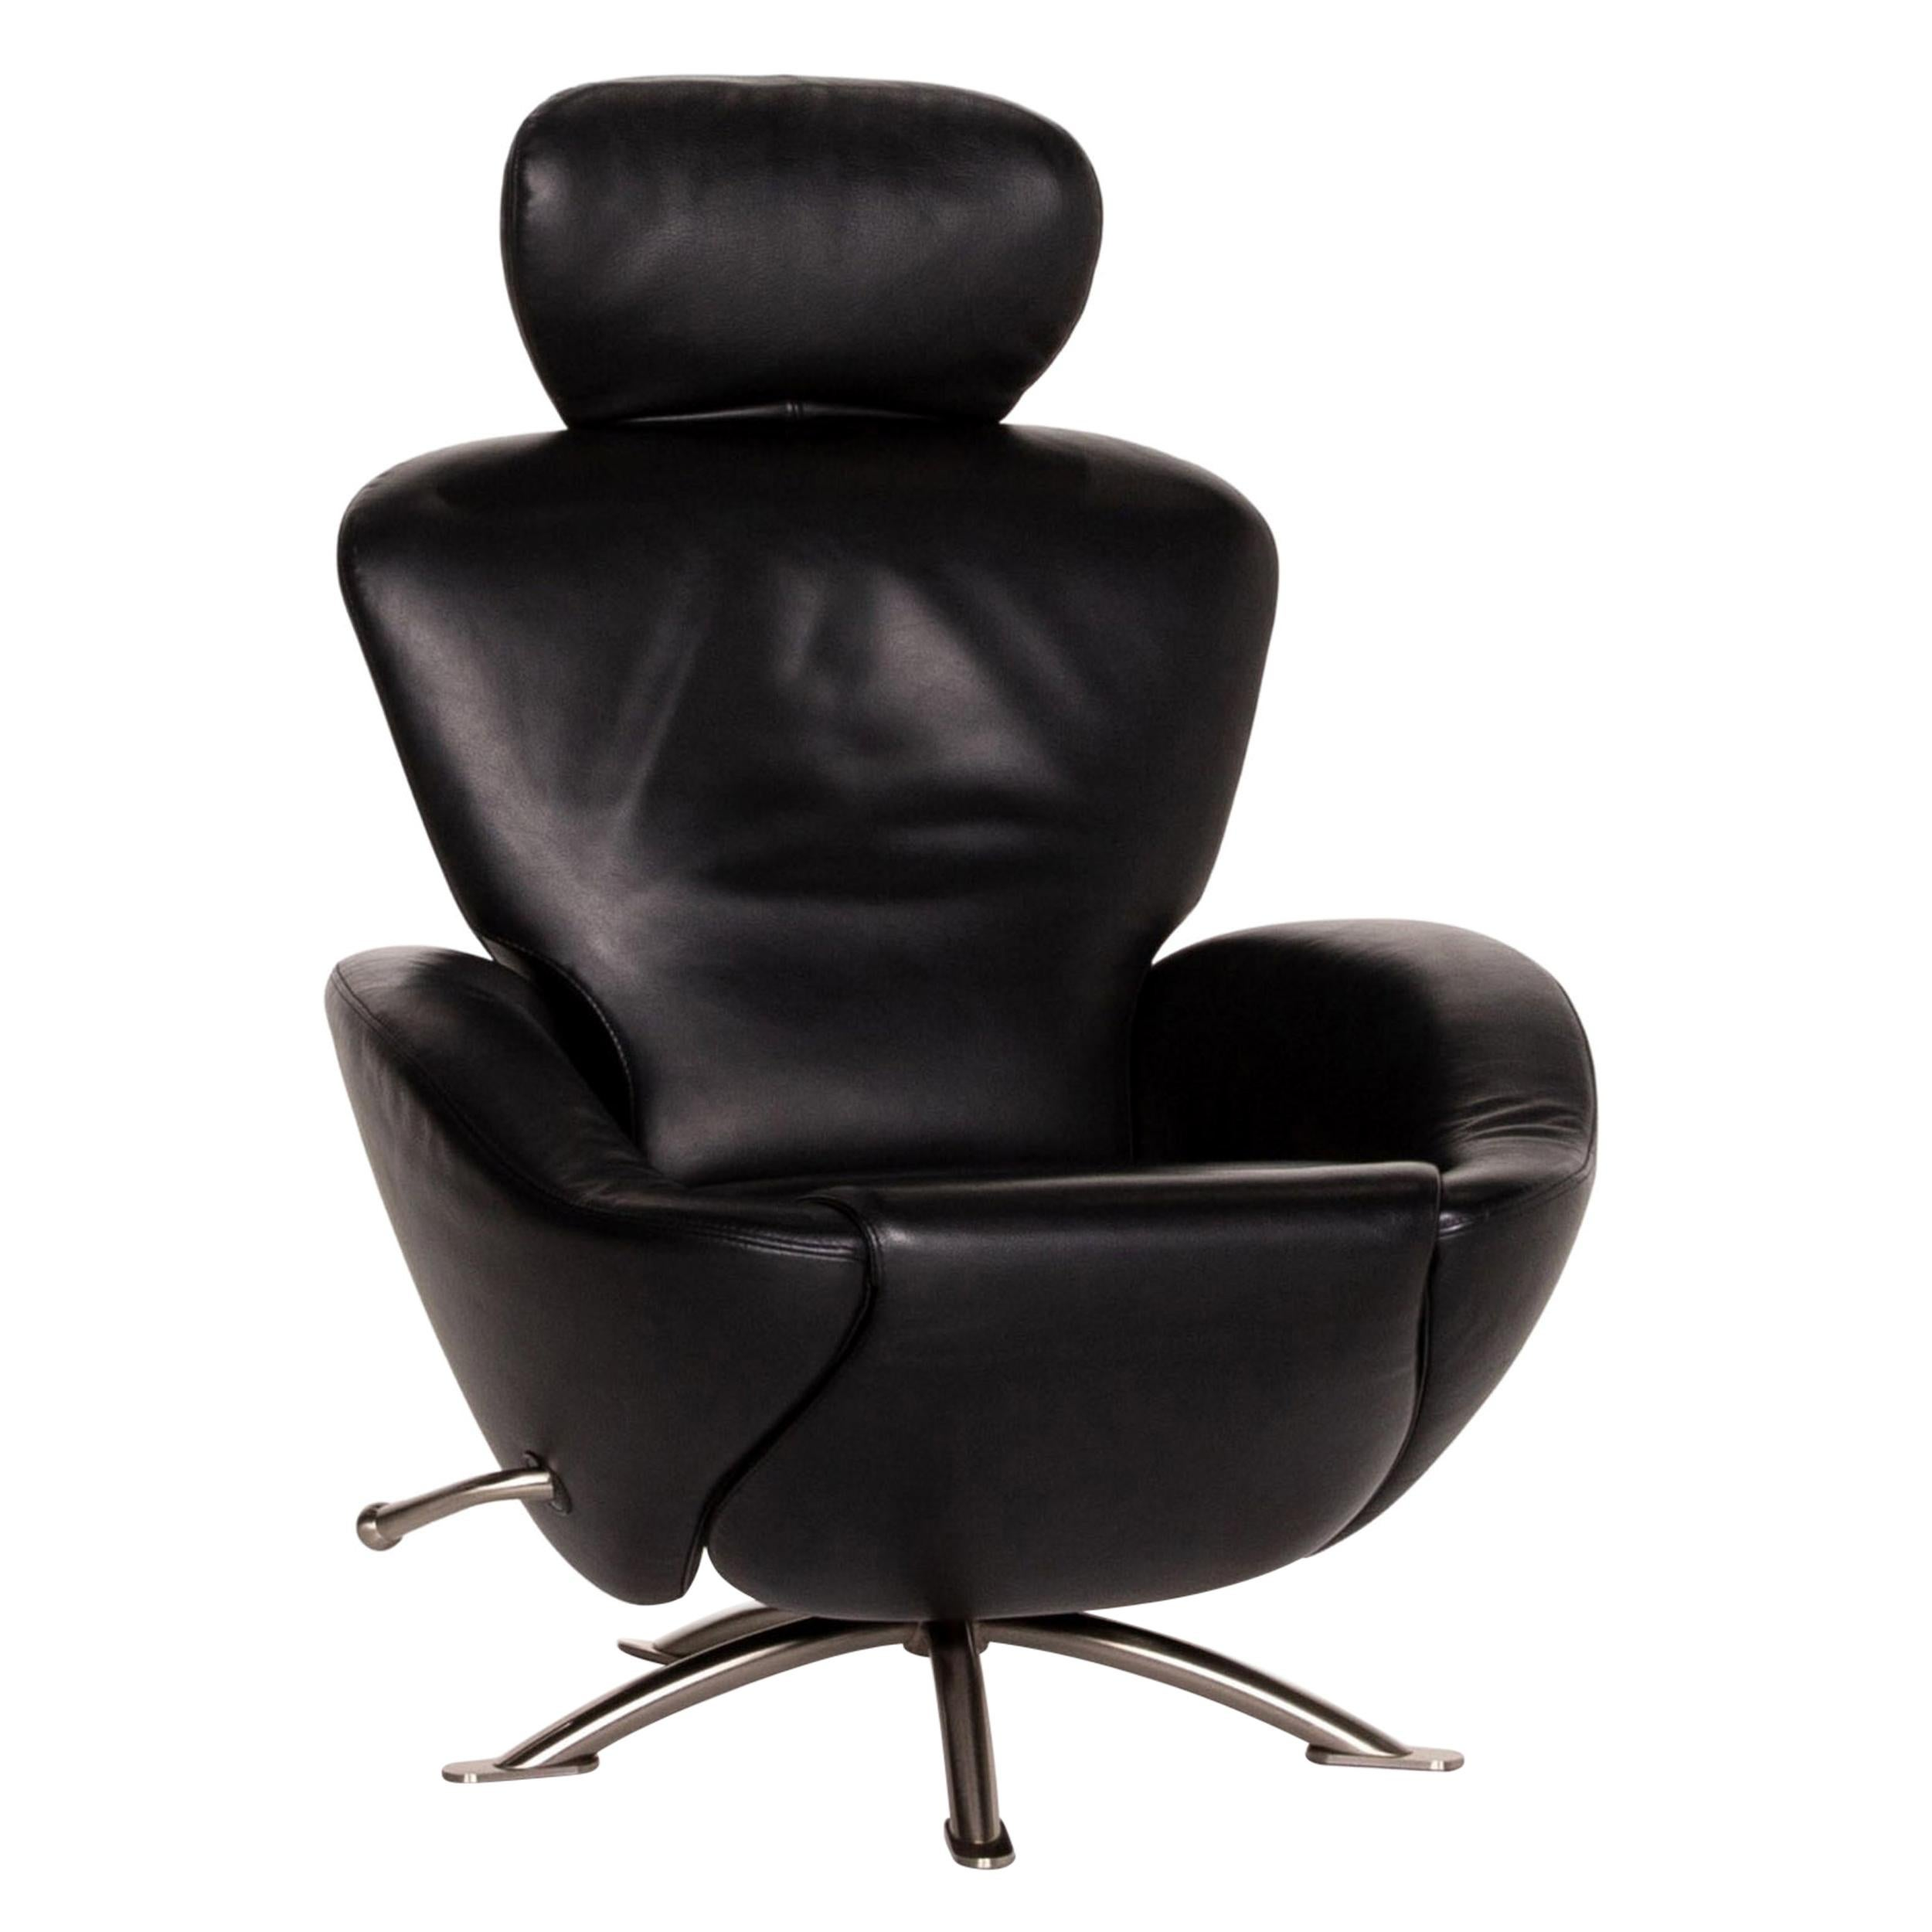 Toshiyuki Kita Chairs